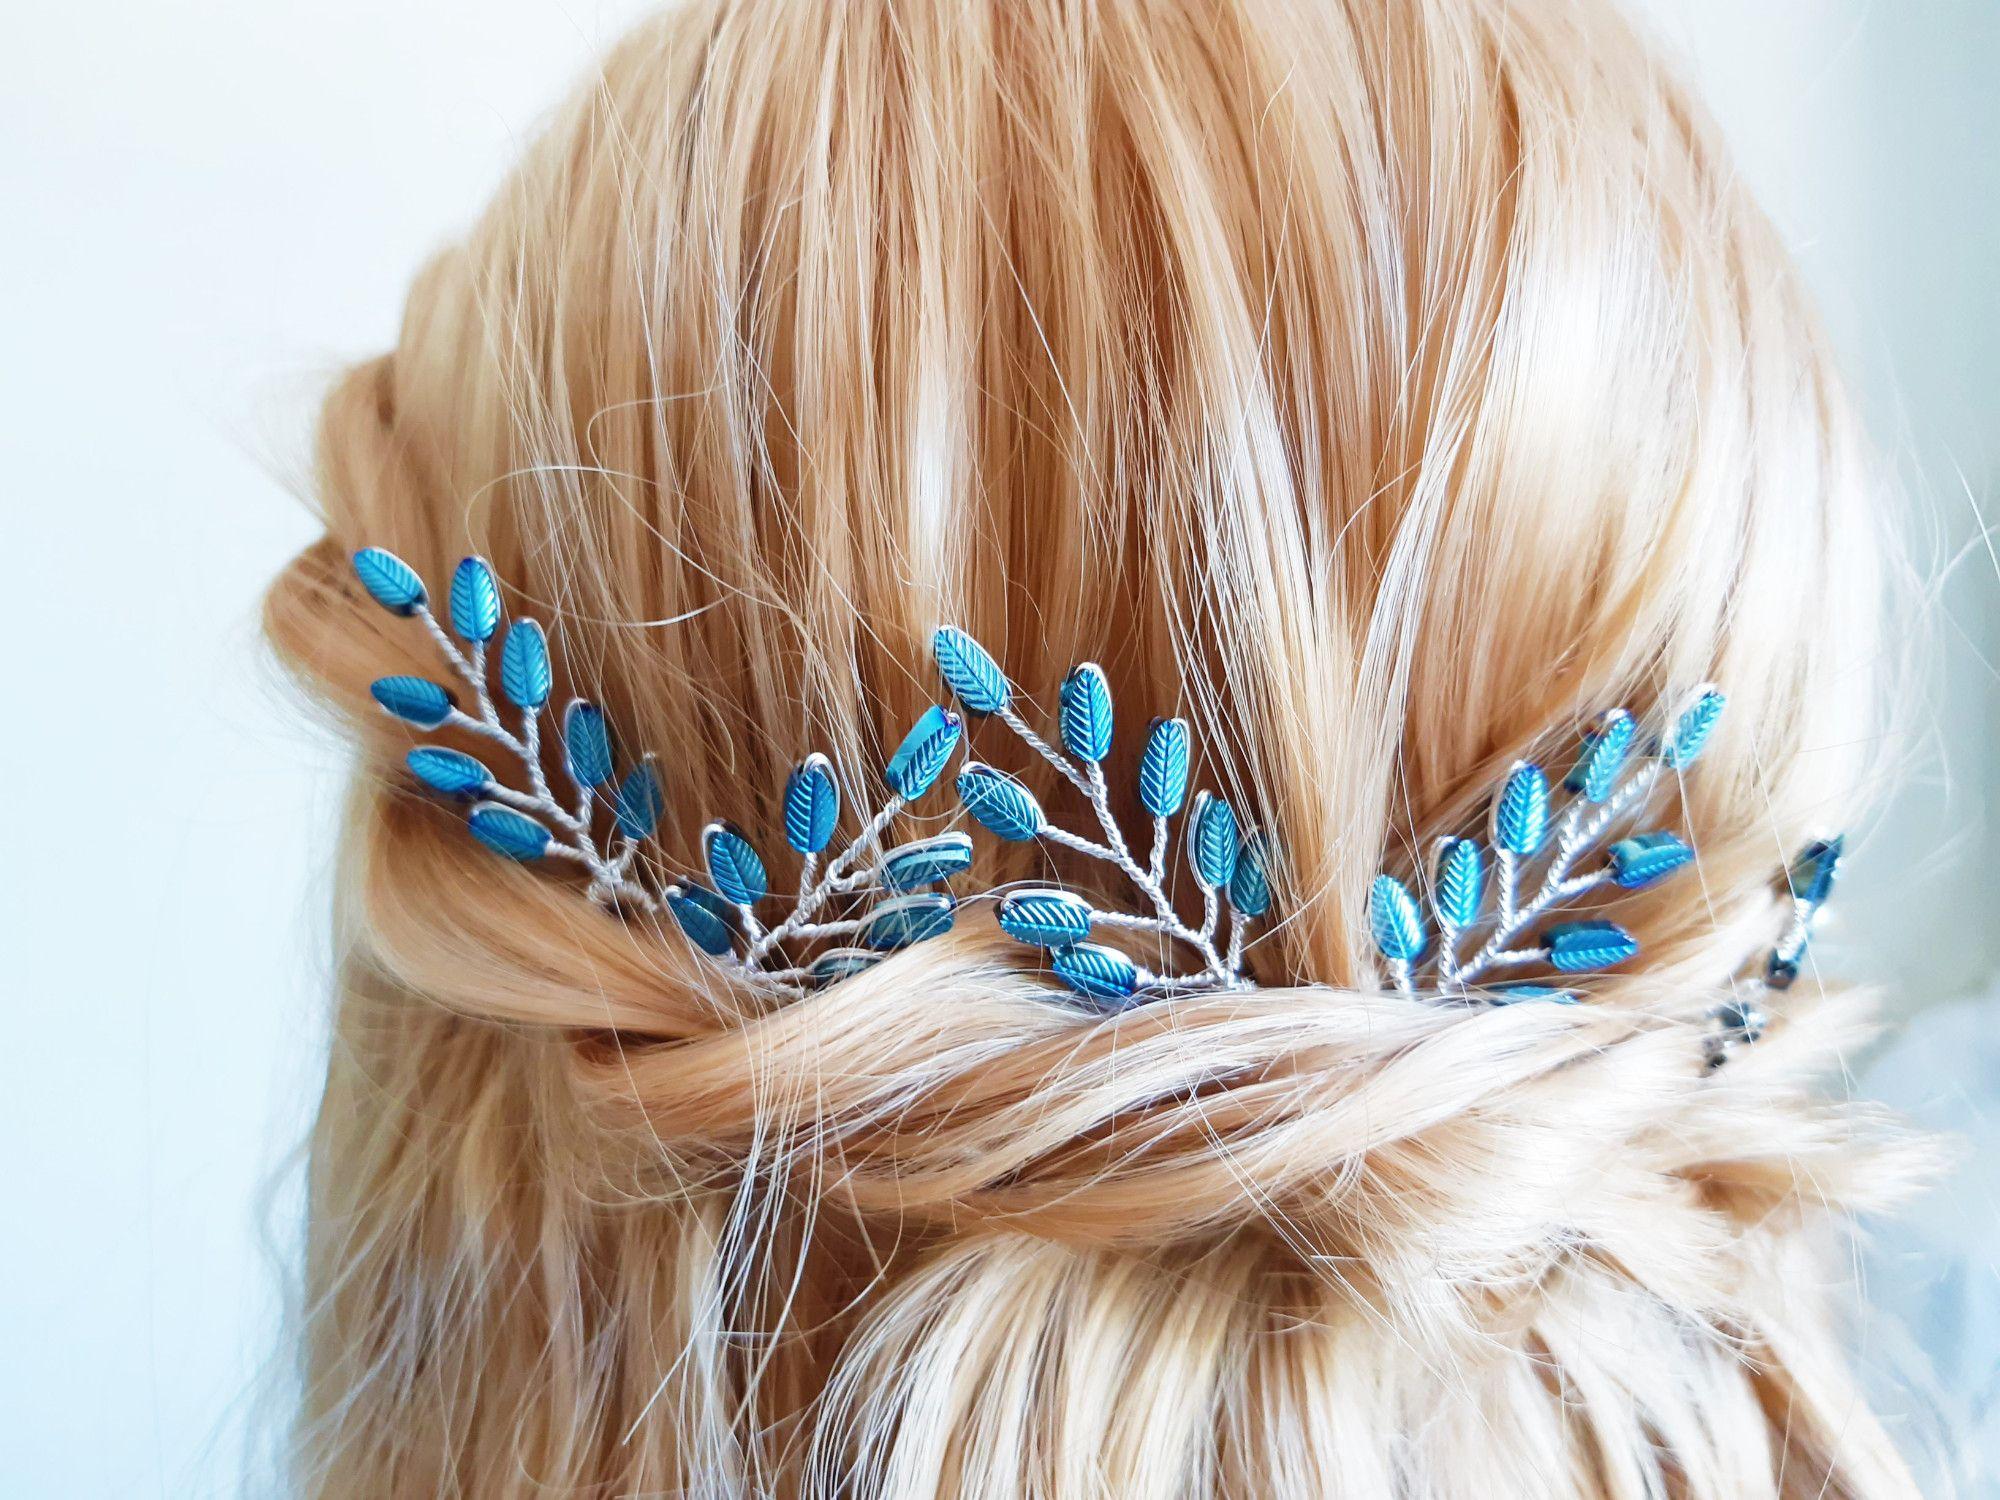 Bespoke-Custom-made-occasion hair accessories-Gloucestershire-Uk